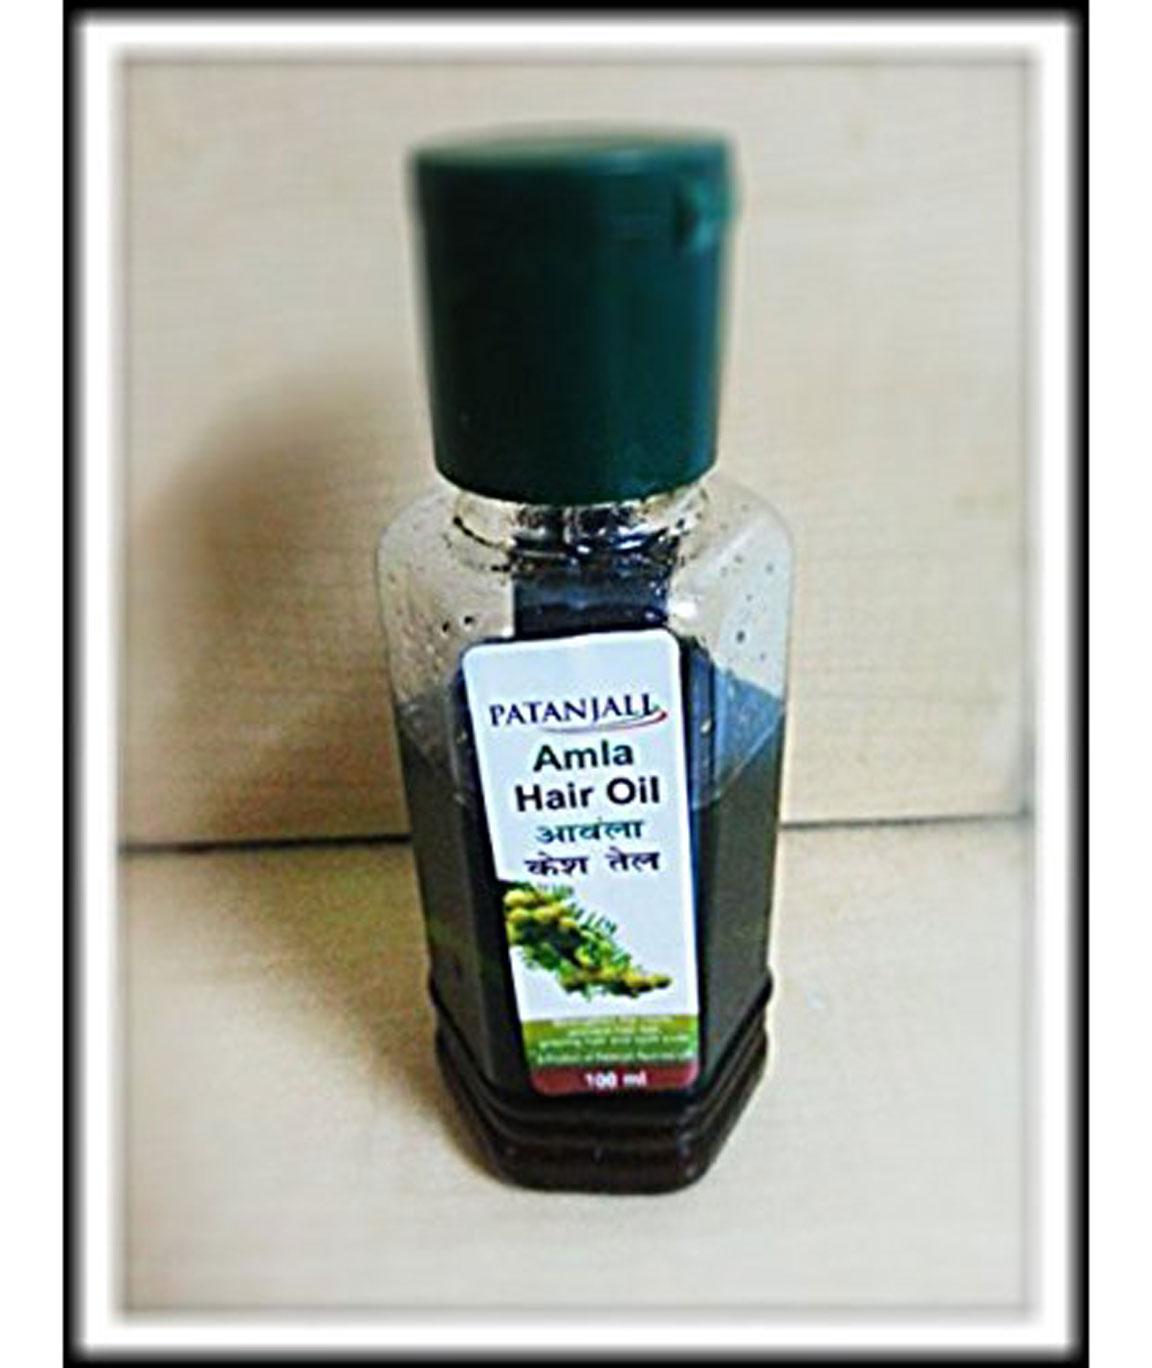 Patanjali Amla Hair Oil, 50 ml